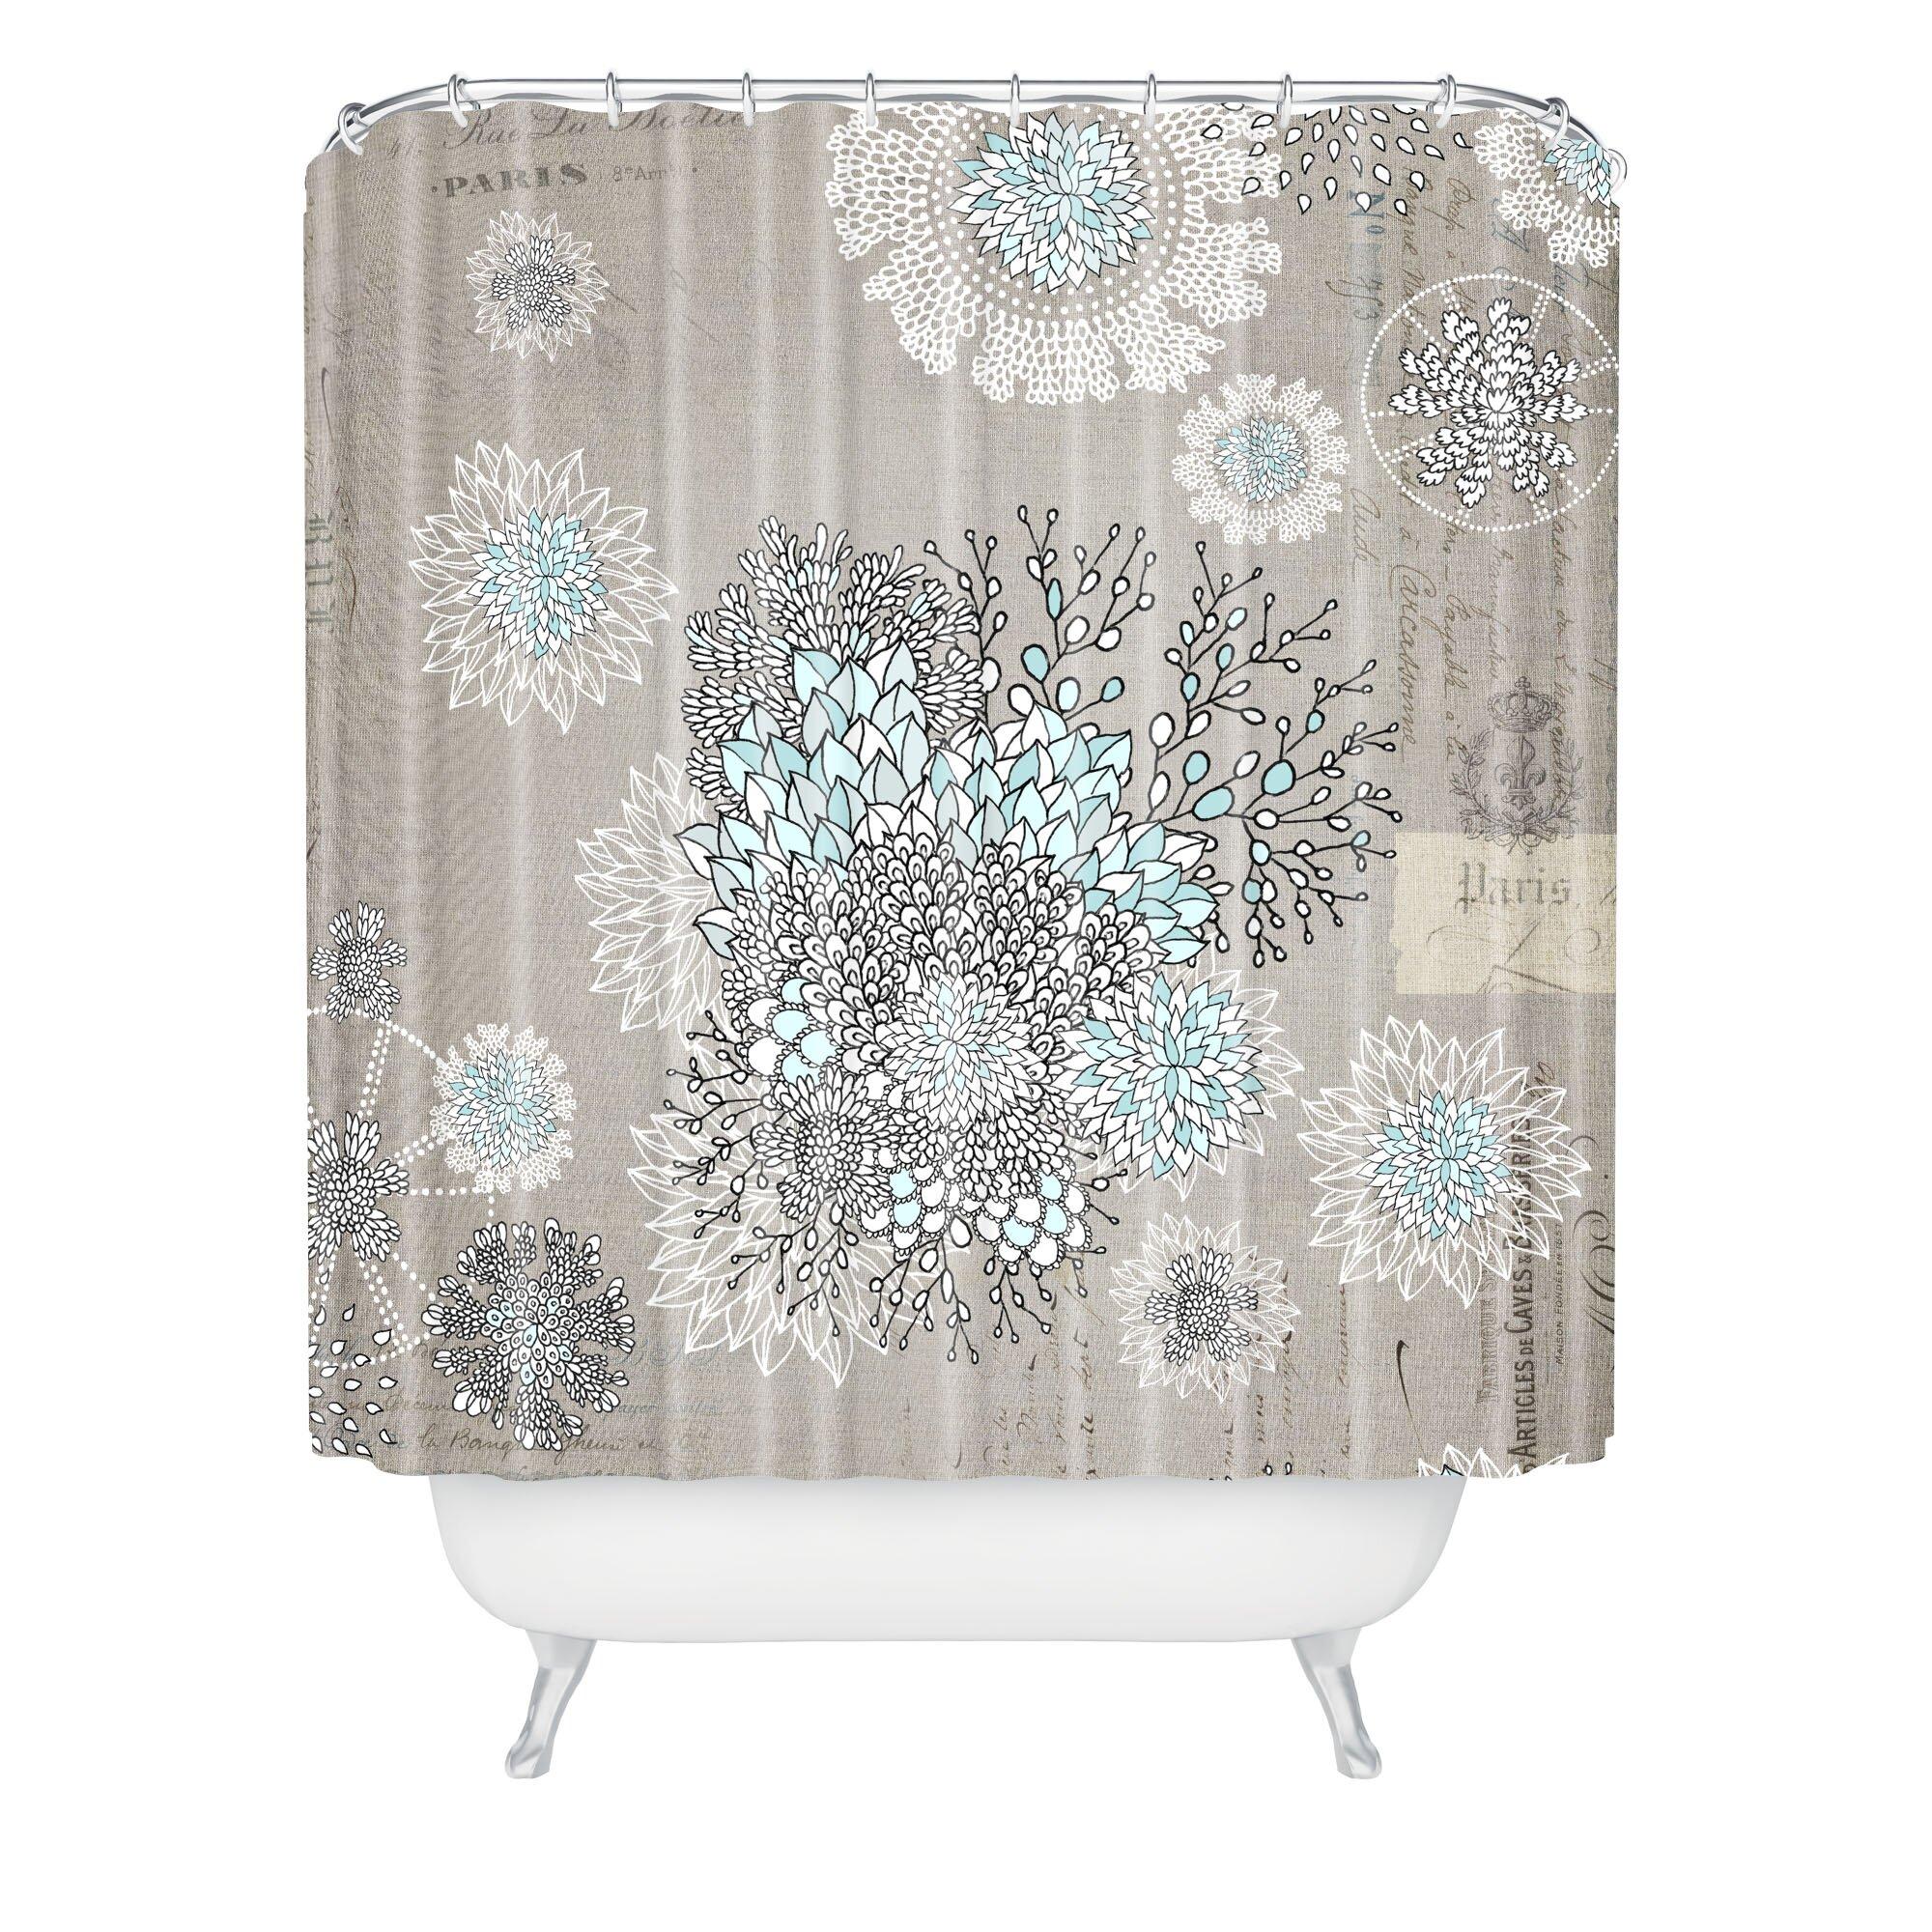 Bungalow Rose Terra Shower Curtain  Reviews Wayfair - Beige and gray shower curtain